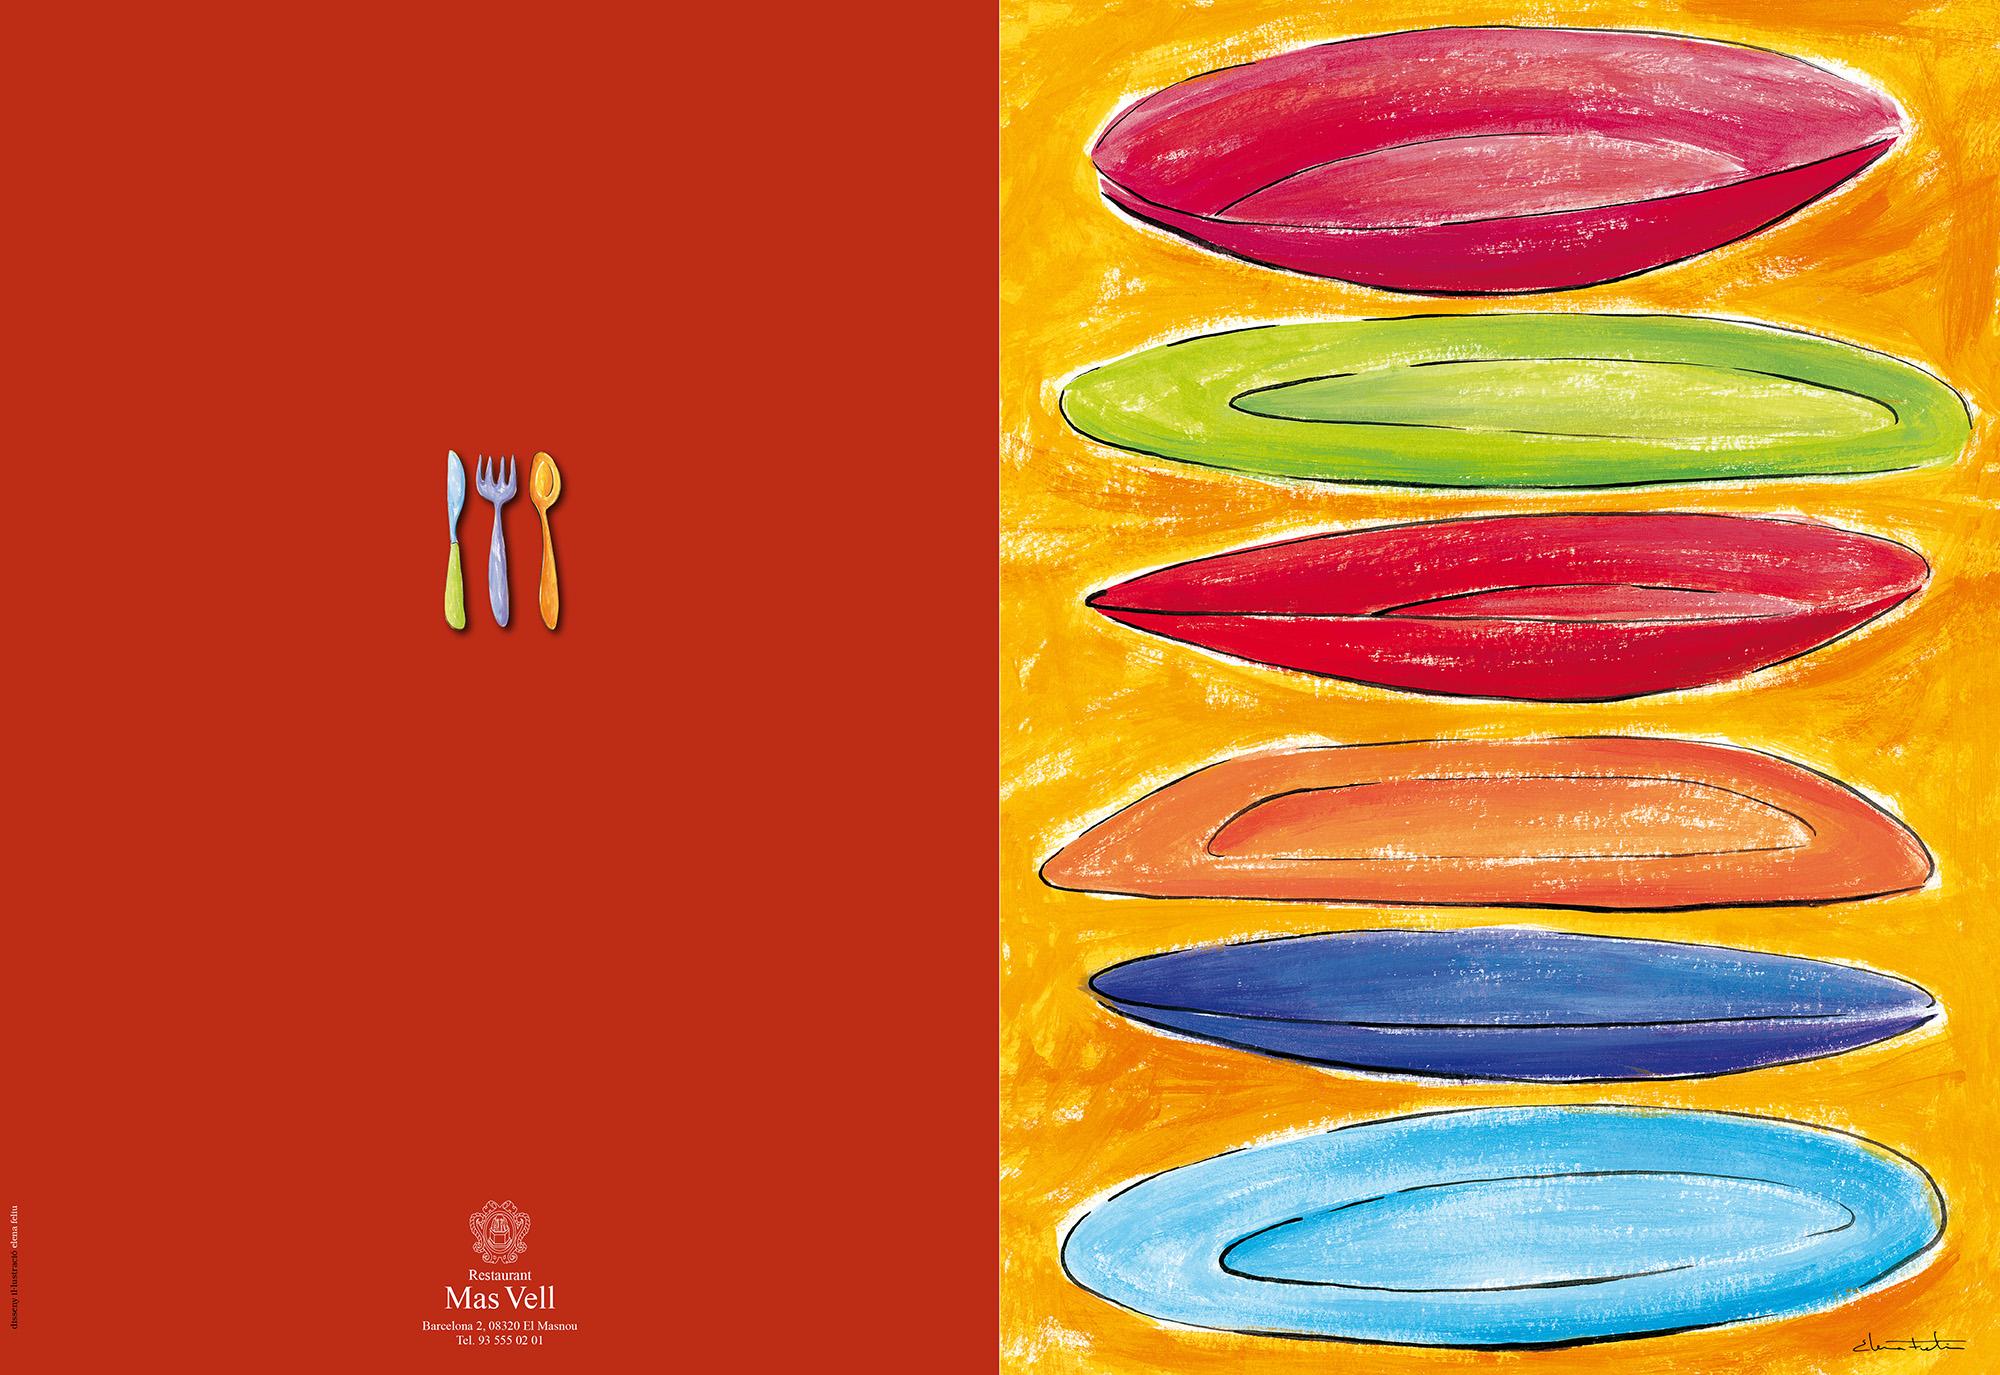 Carta restaurant Mas Vell del Masnou